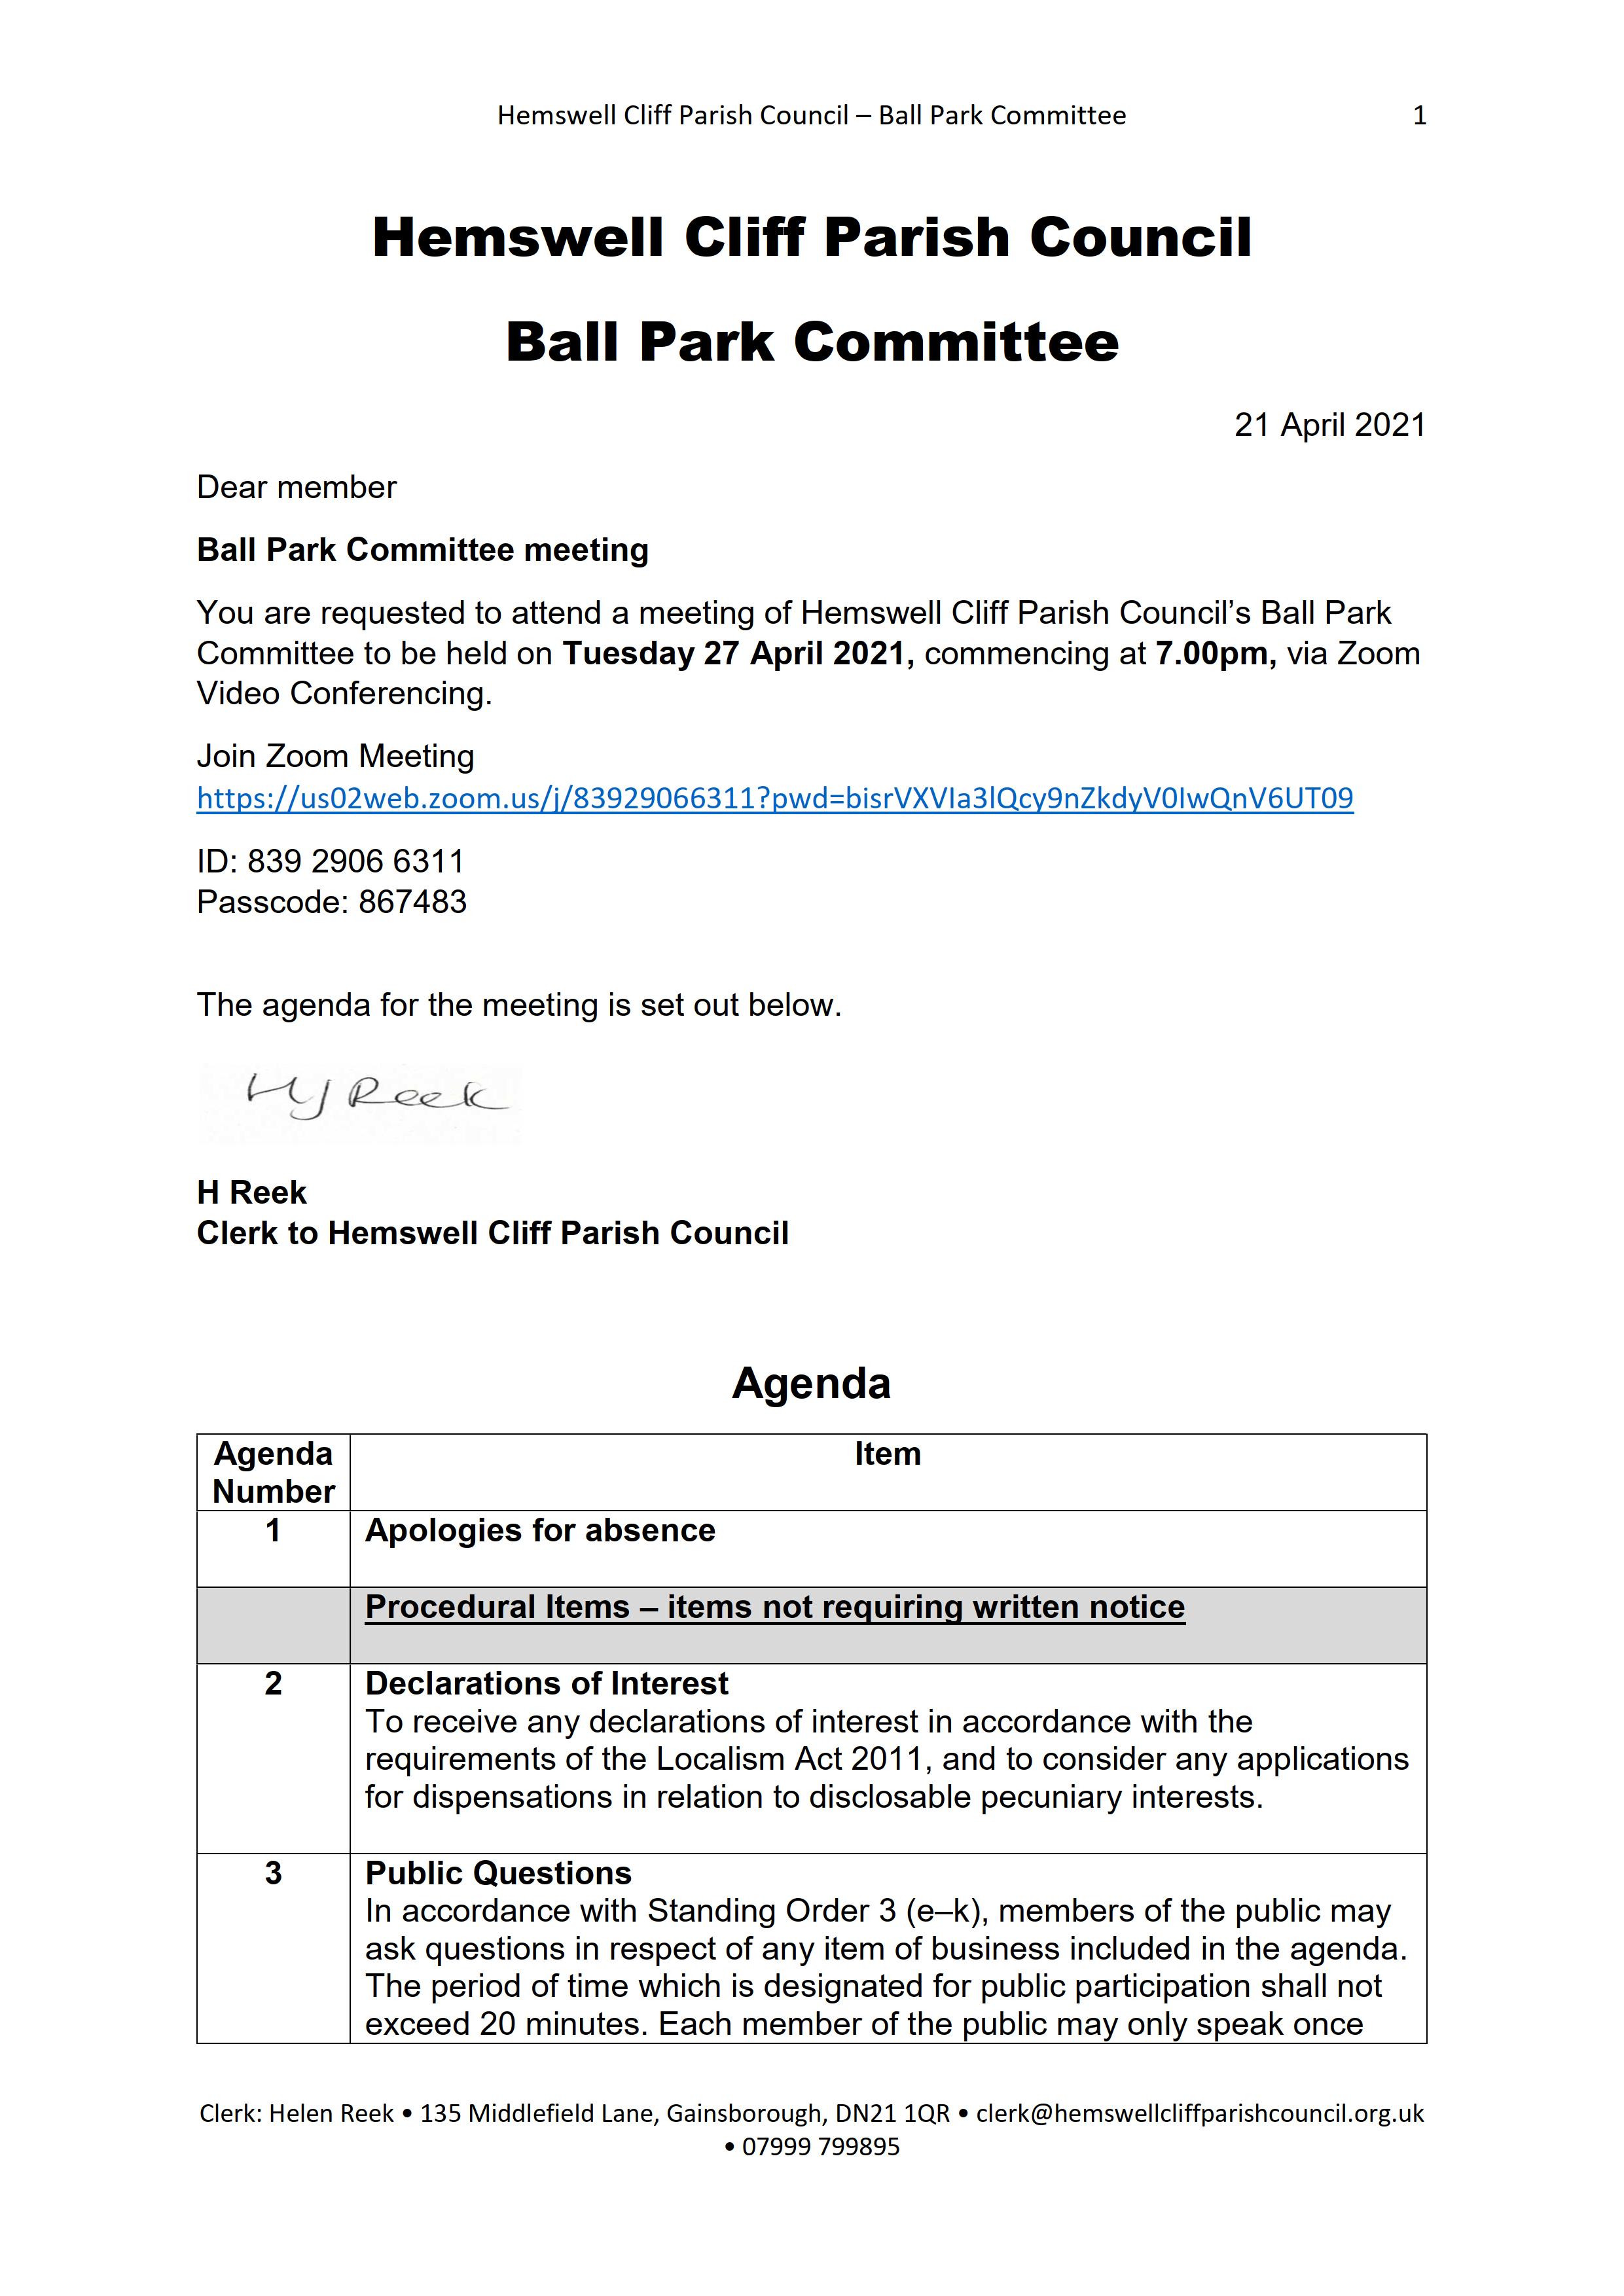 HCPC_BallPark_Agenda_27.04.21_1.png